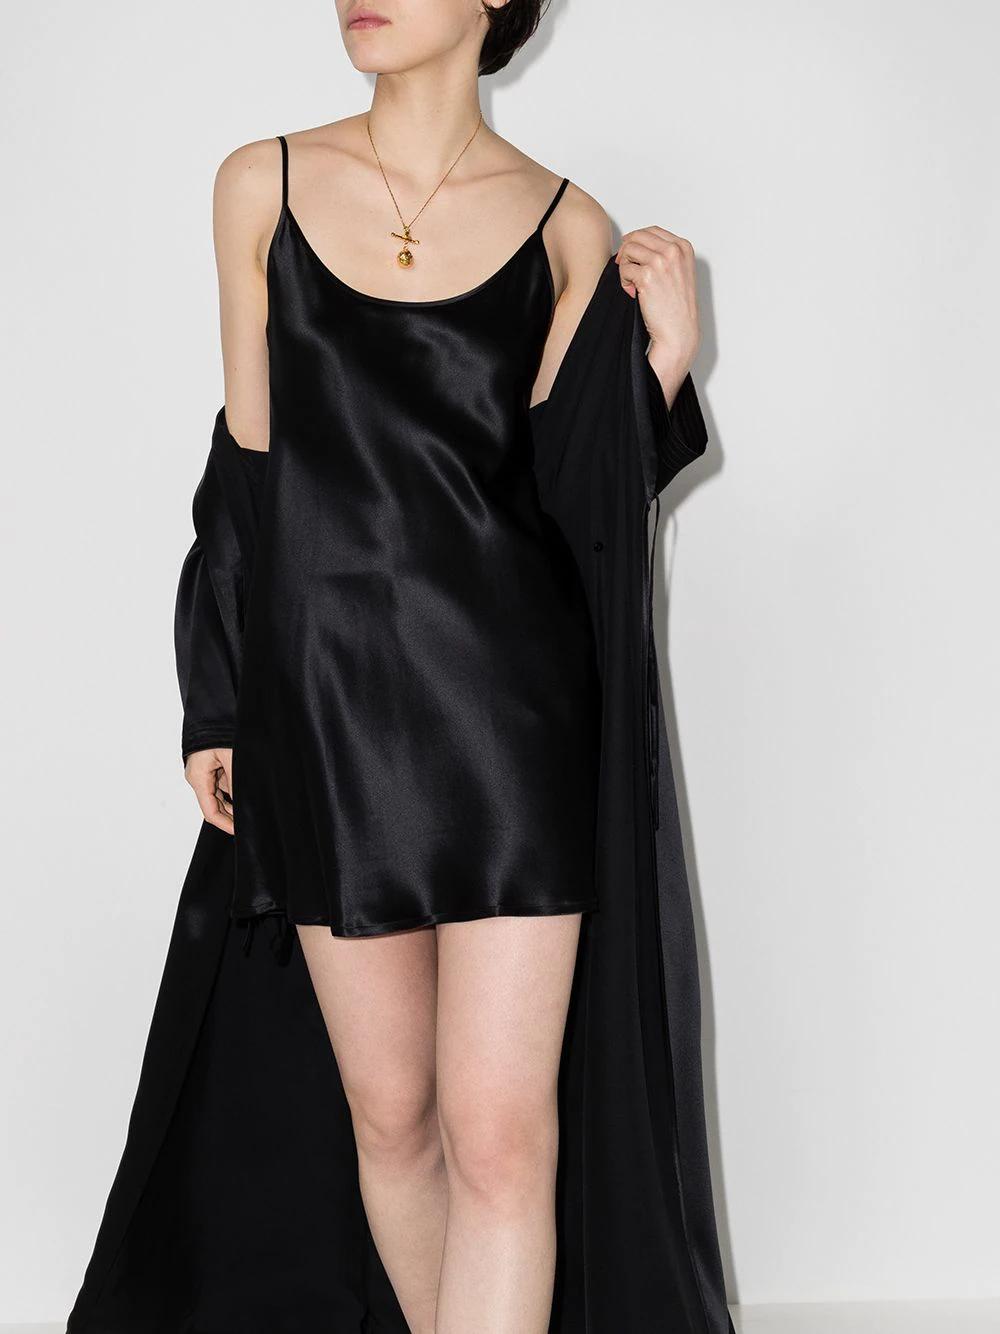 La Perla Silk Nightdress 359лв